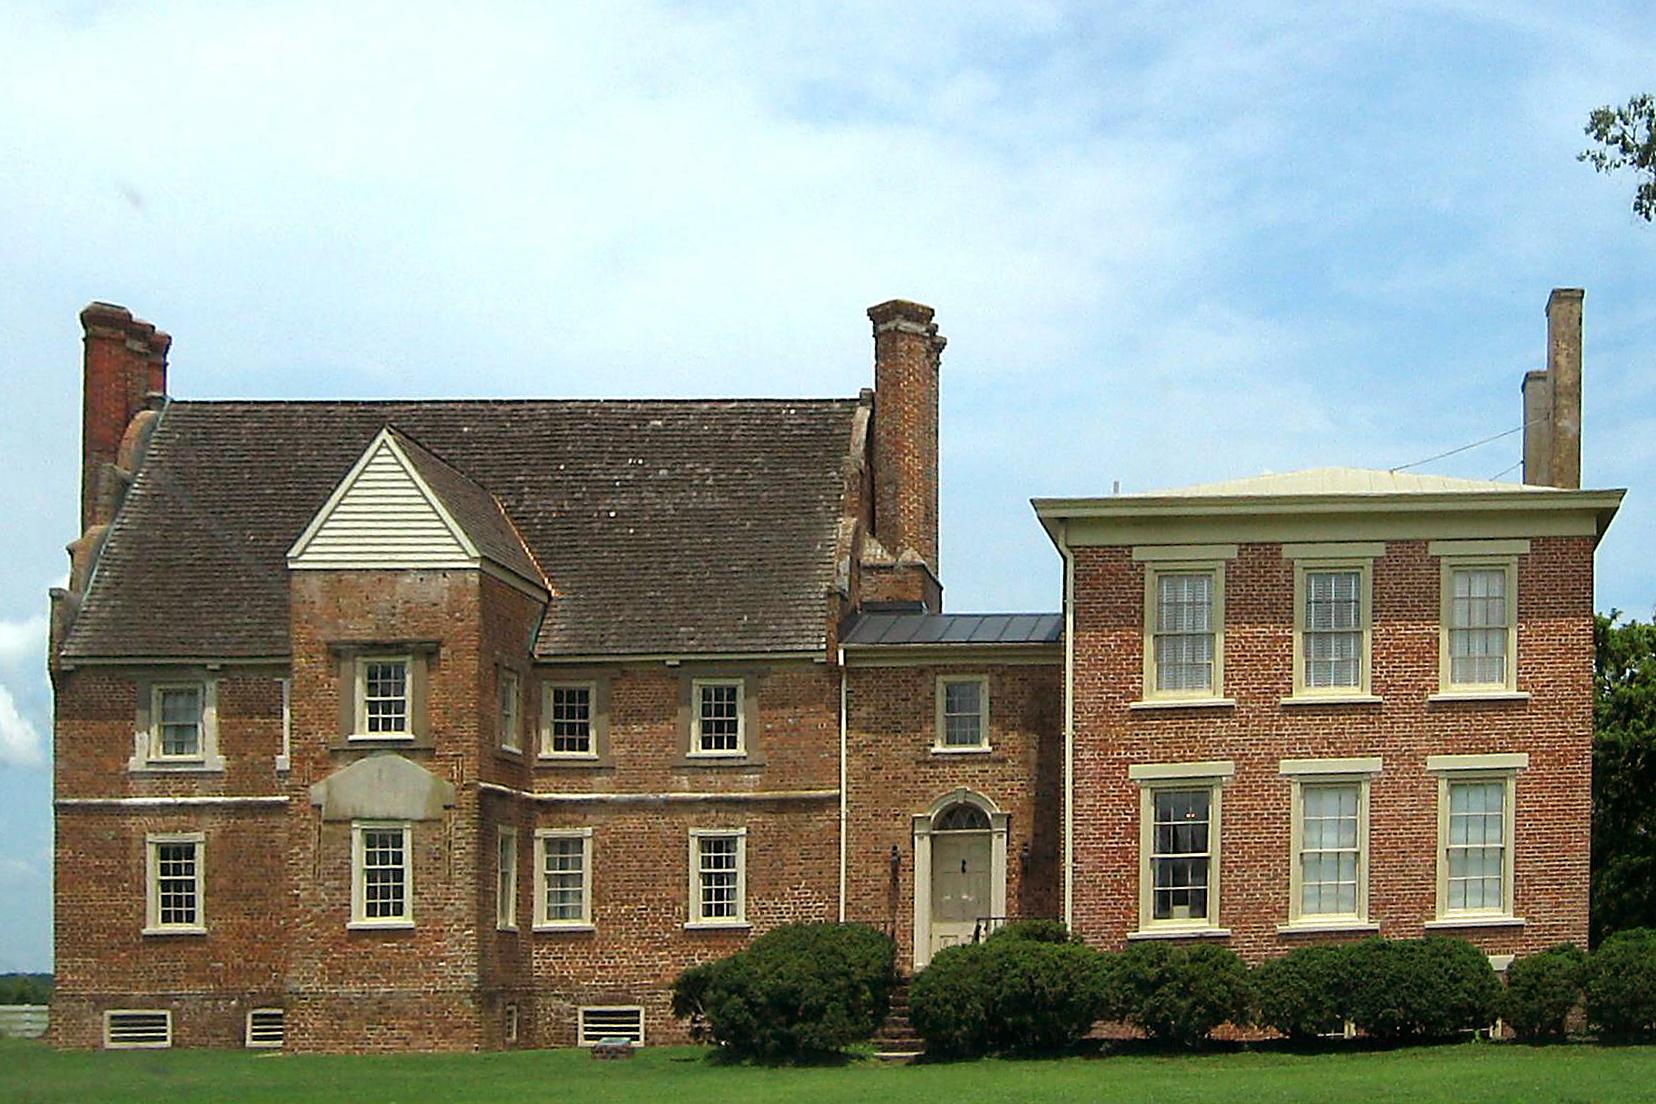 Bacon's Castle, image courtesy of Wikipedia.